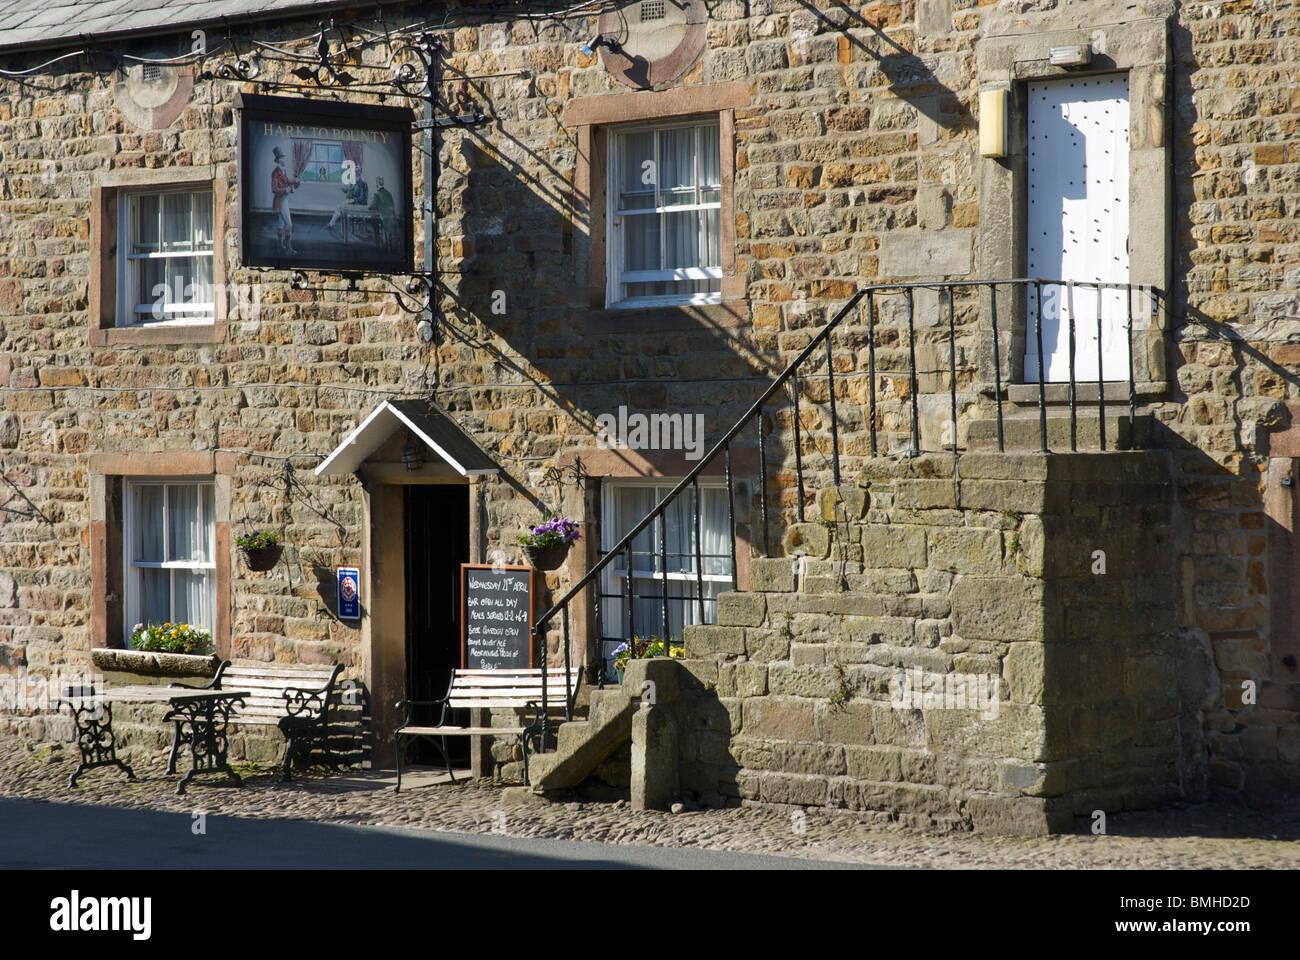 Hark de Bounty pub, Slaidburn, creux de Bowland, Lancashire, England UK Photo Stock